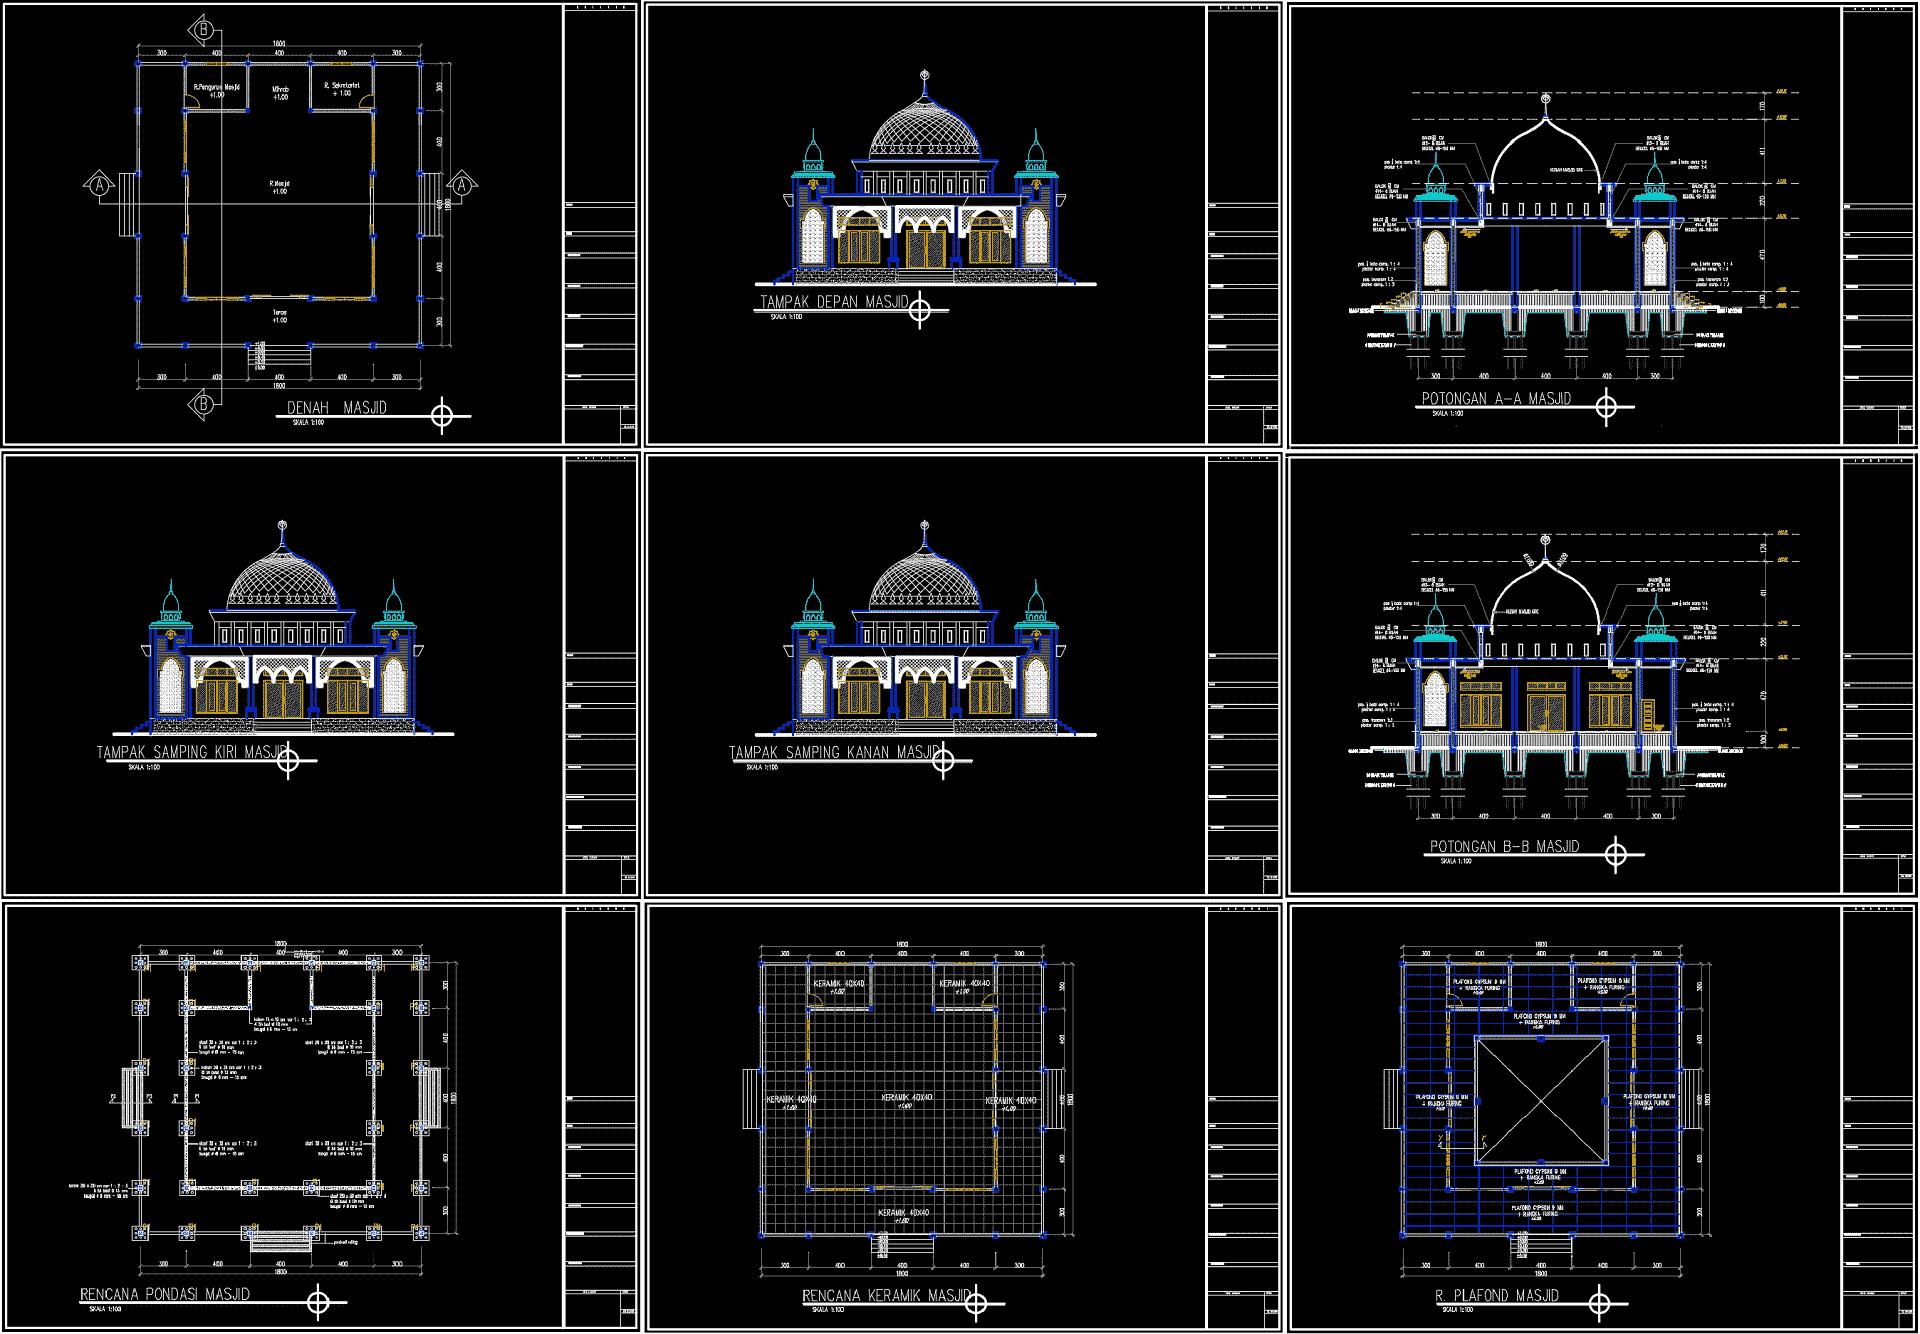 Desain Masjid Lengkap Format Dwg Rumah Joglo Limasan Work